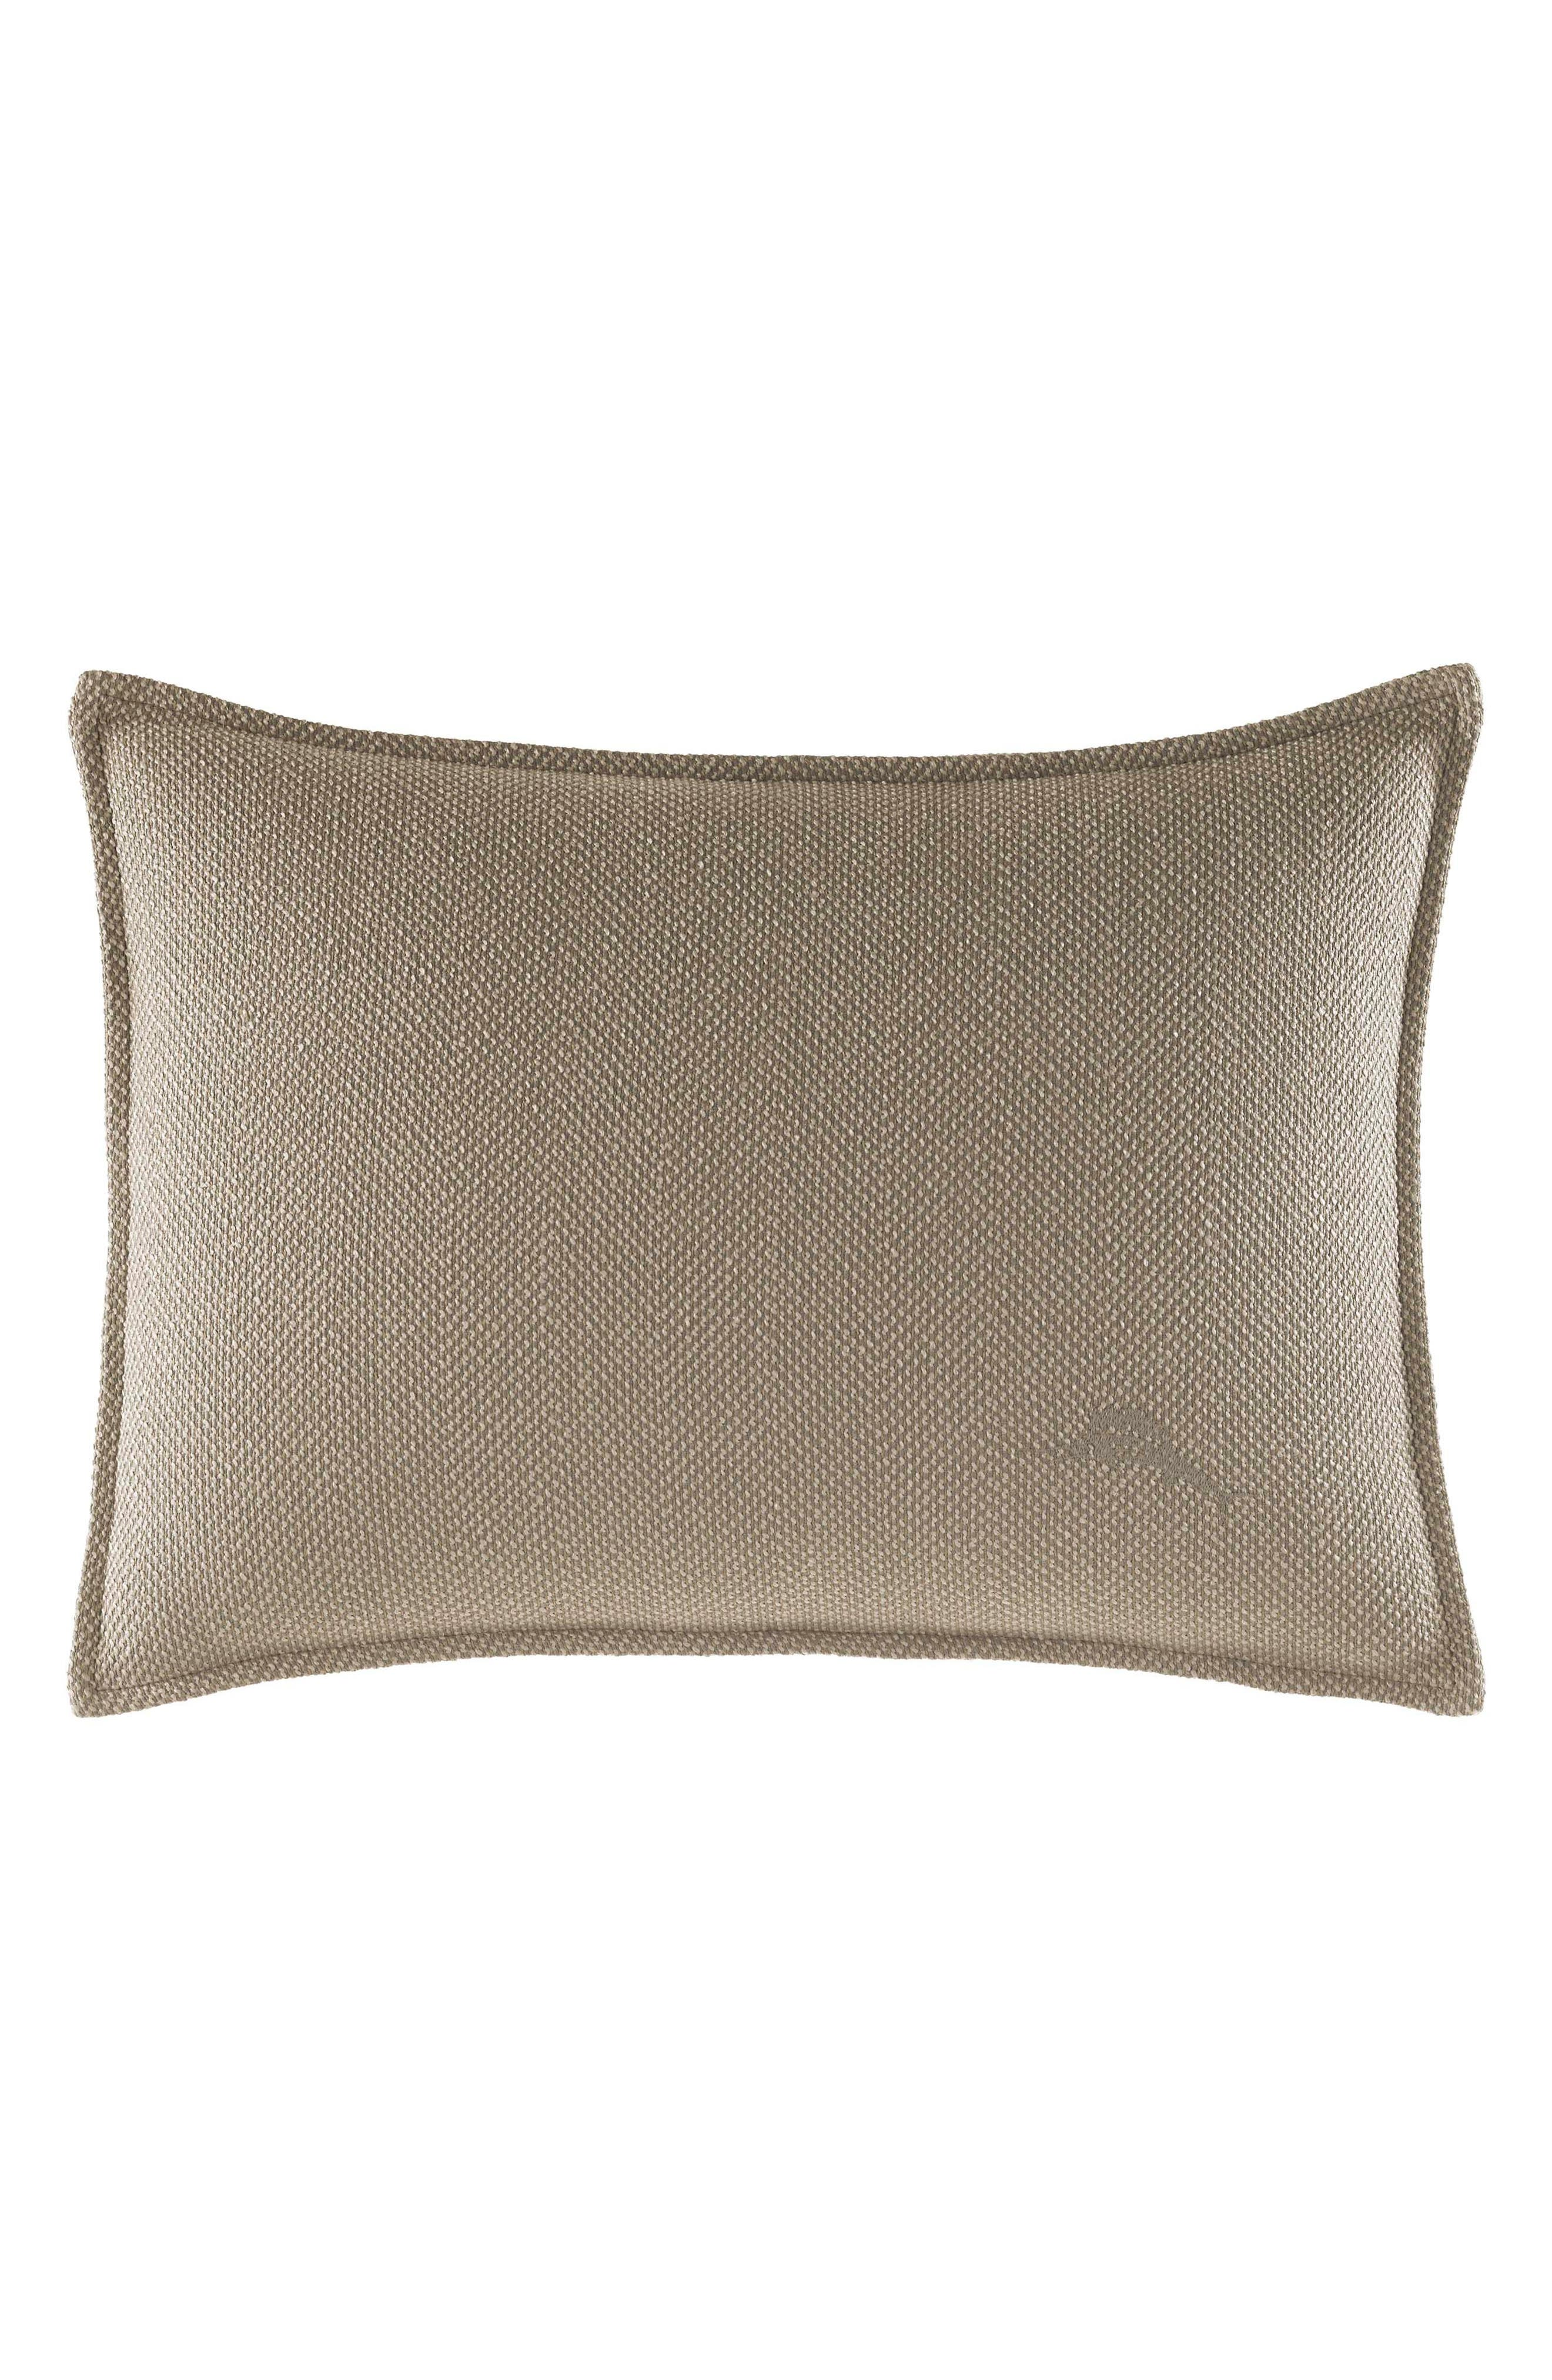 Tommy Bahama Raffia Palms Pillow